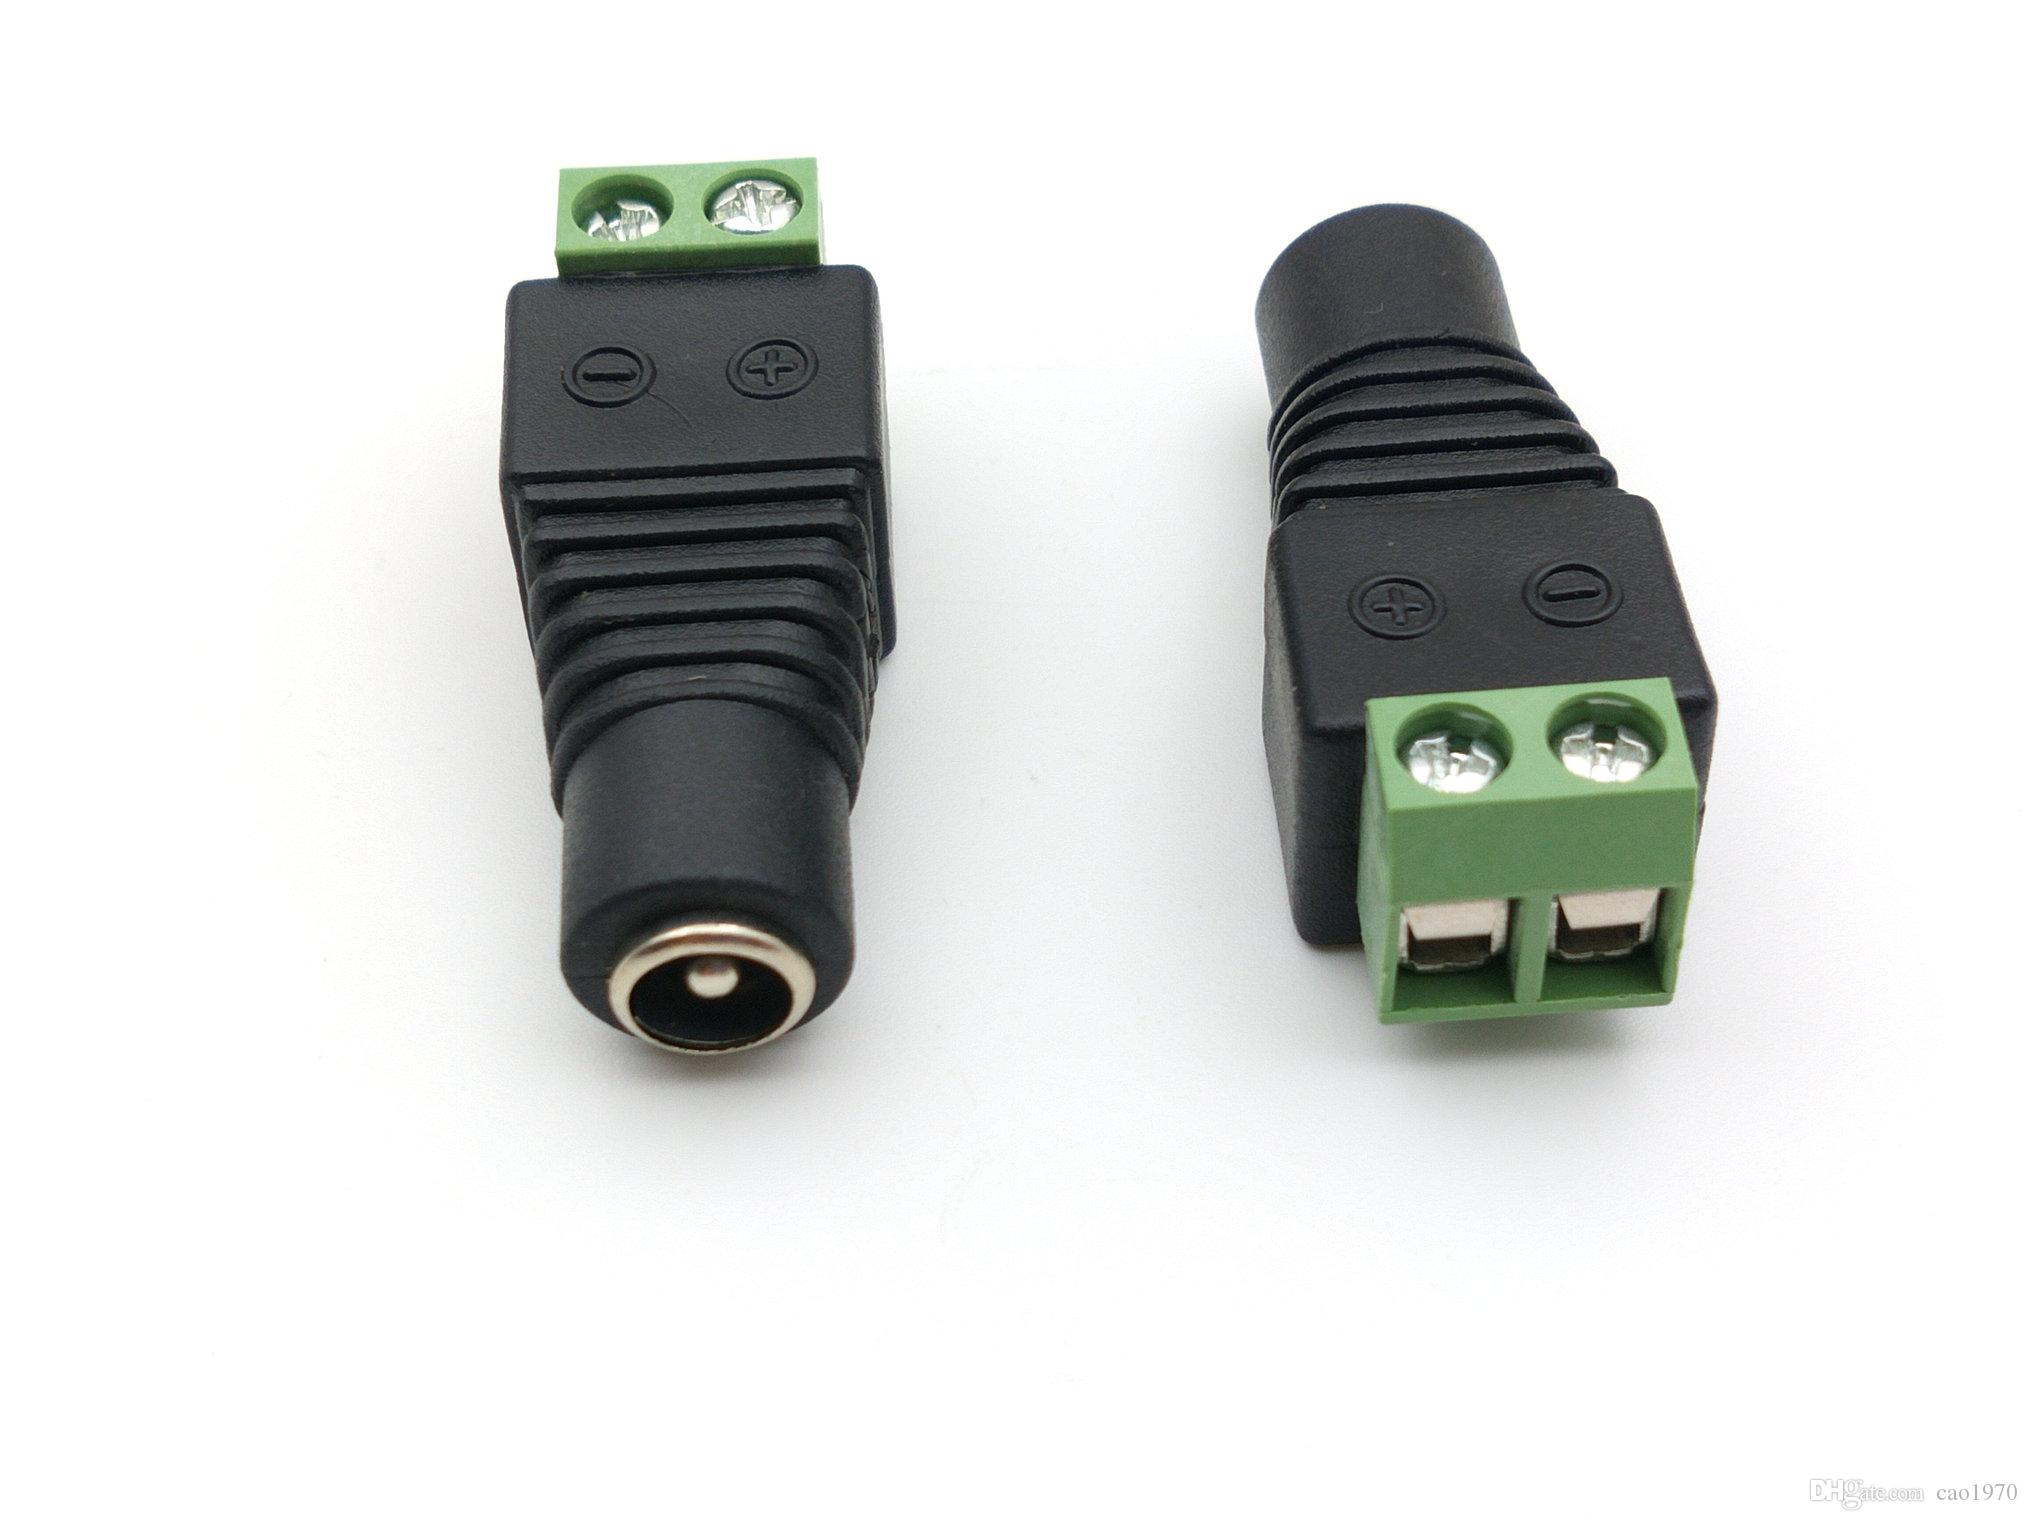 1000PCS و 5.5mm س 2.1 DC قوة أنثى التوصيل موصل محول للكاميرا CCTV